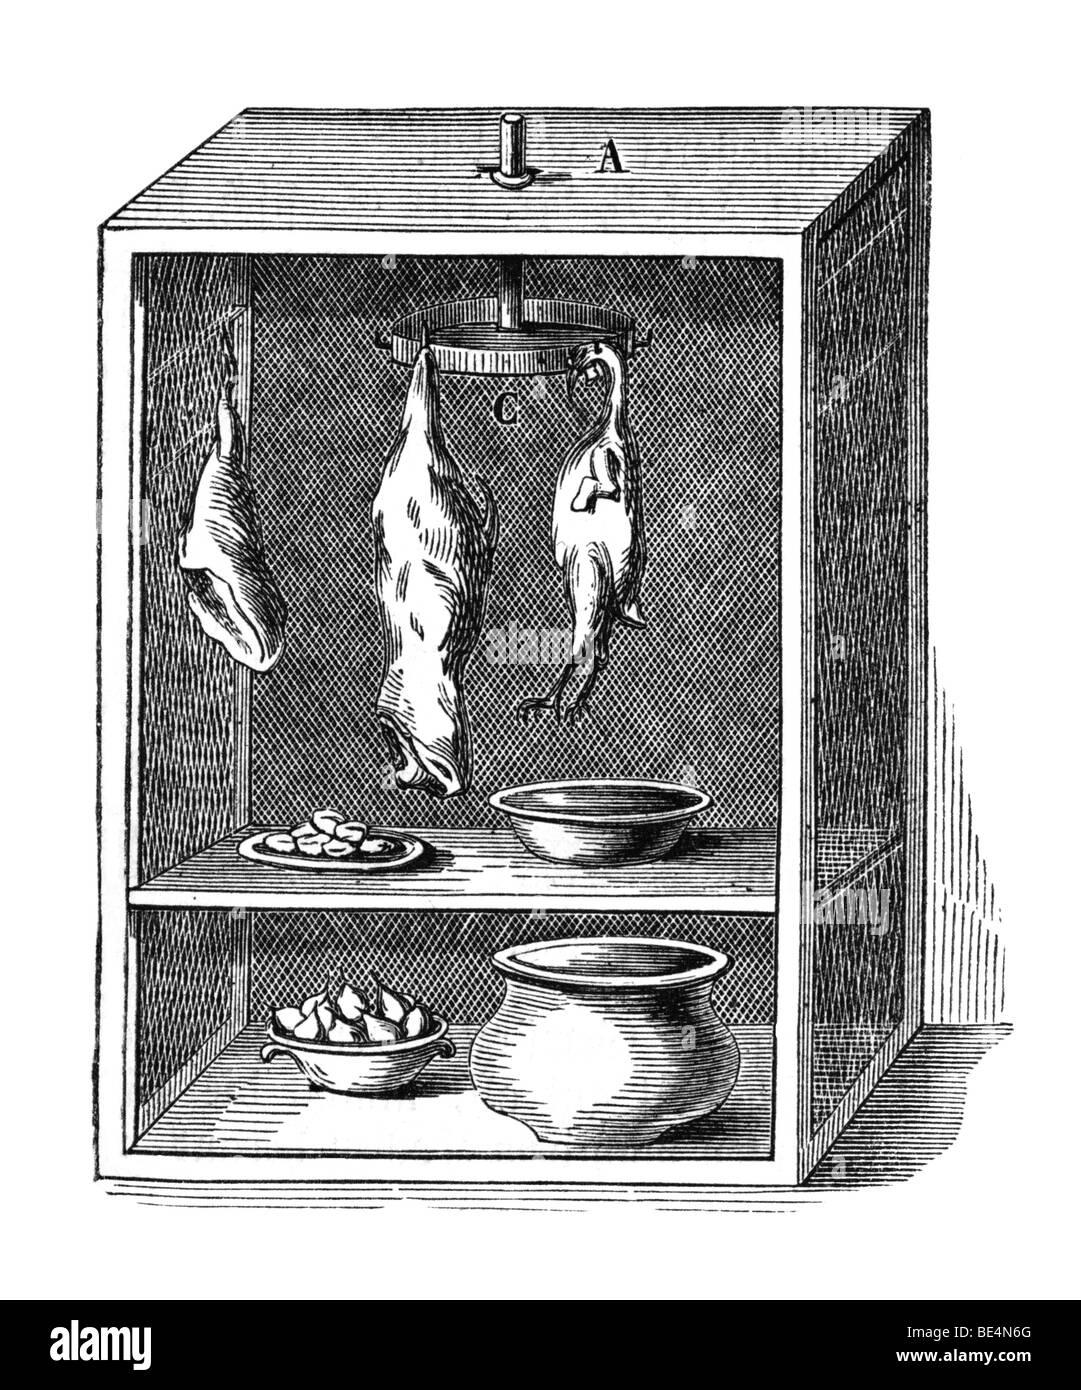 Fly Box, historical illustration from: Marie Adenfeller, Friedrich Werner: Illustriertes Koch- und Haushaltungsbuch, - Stock Image